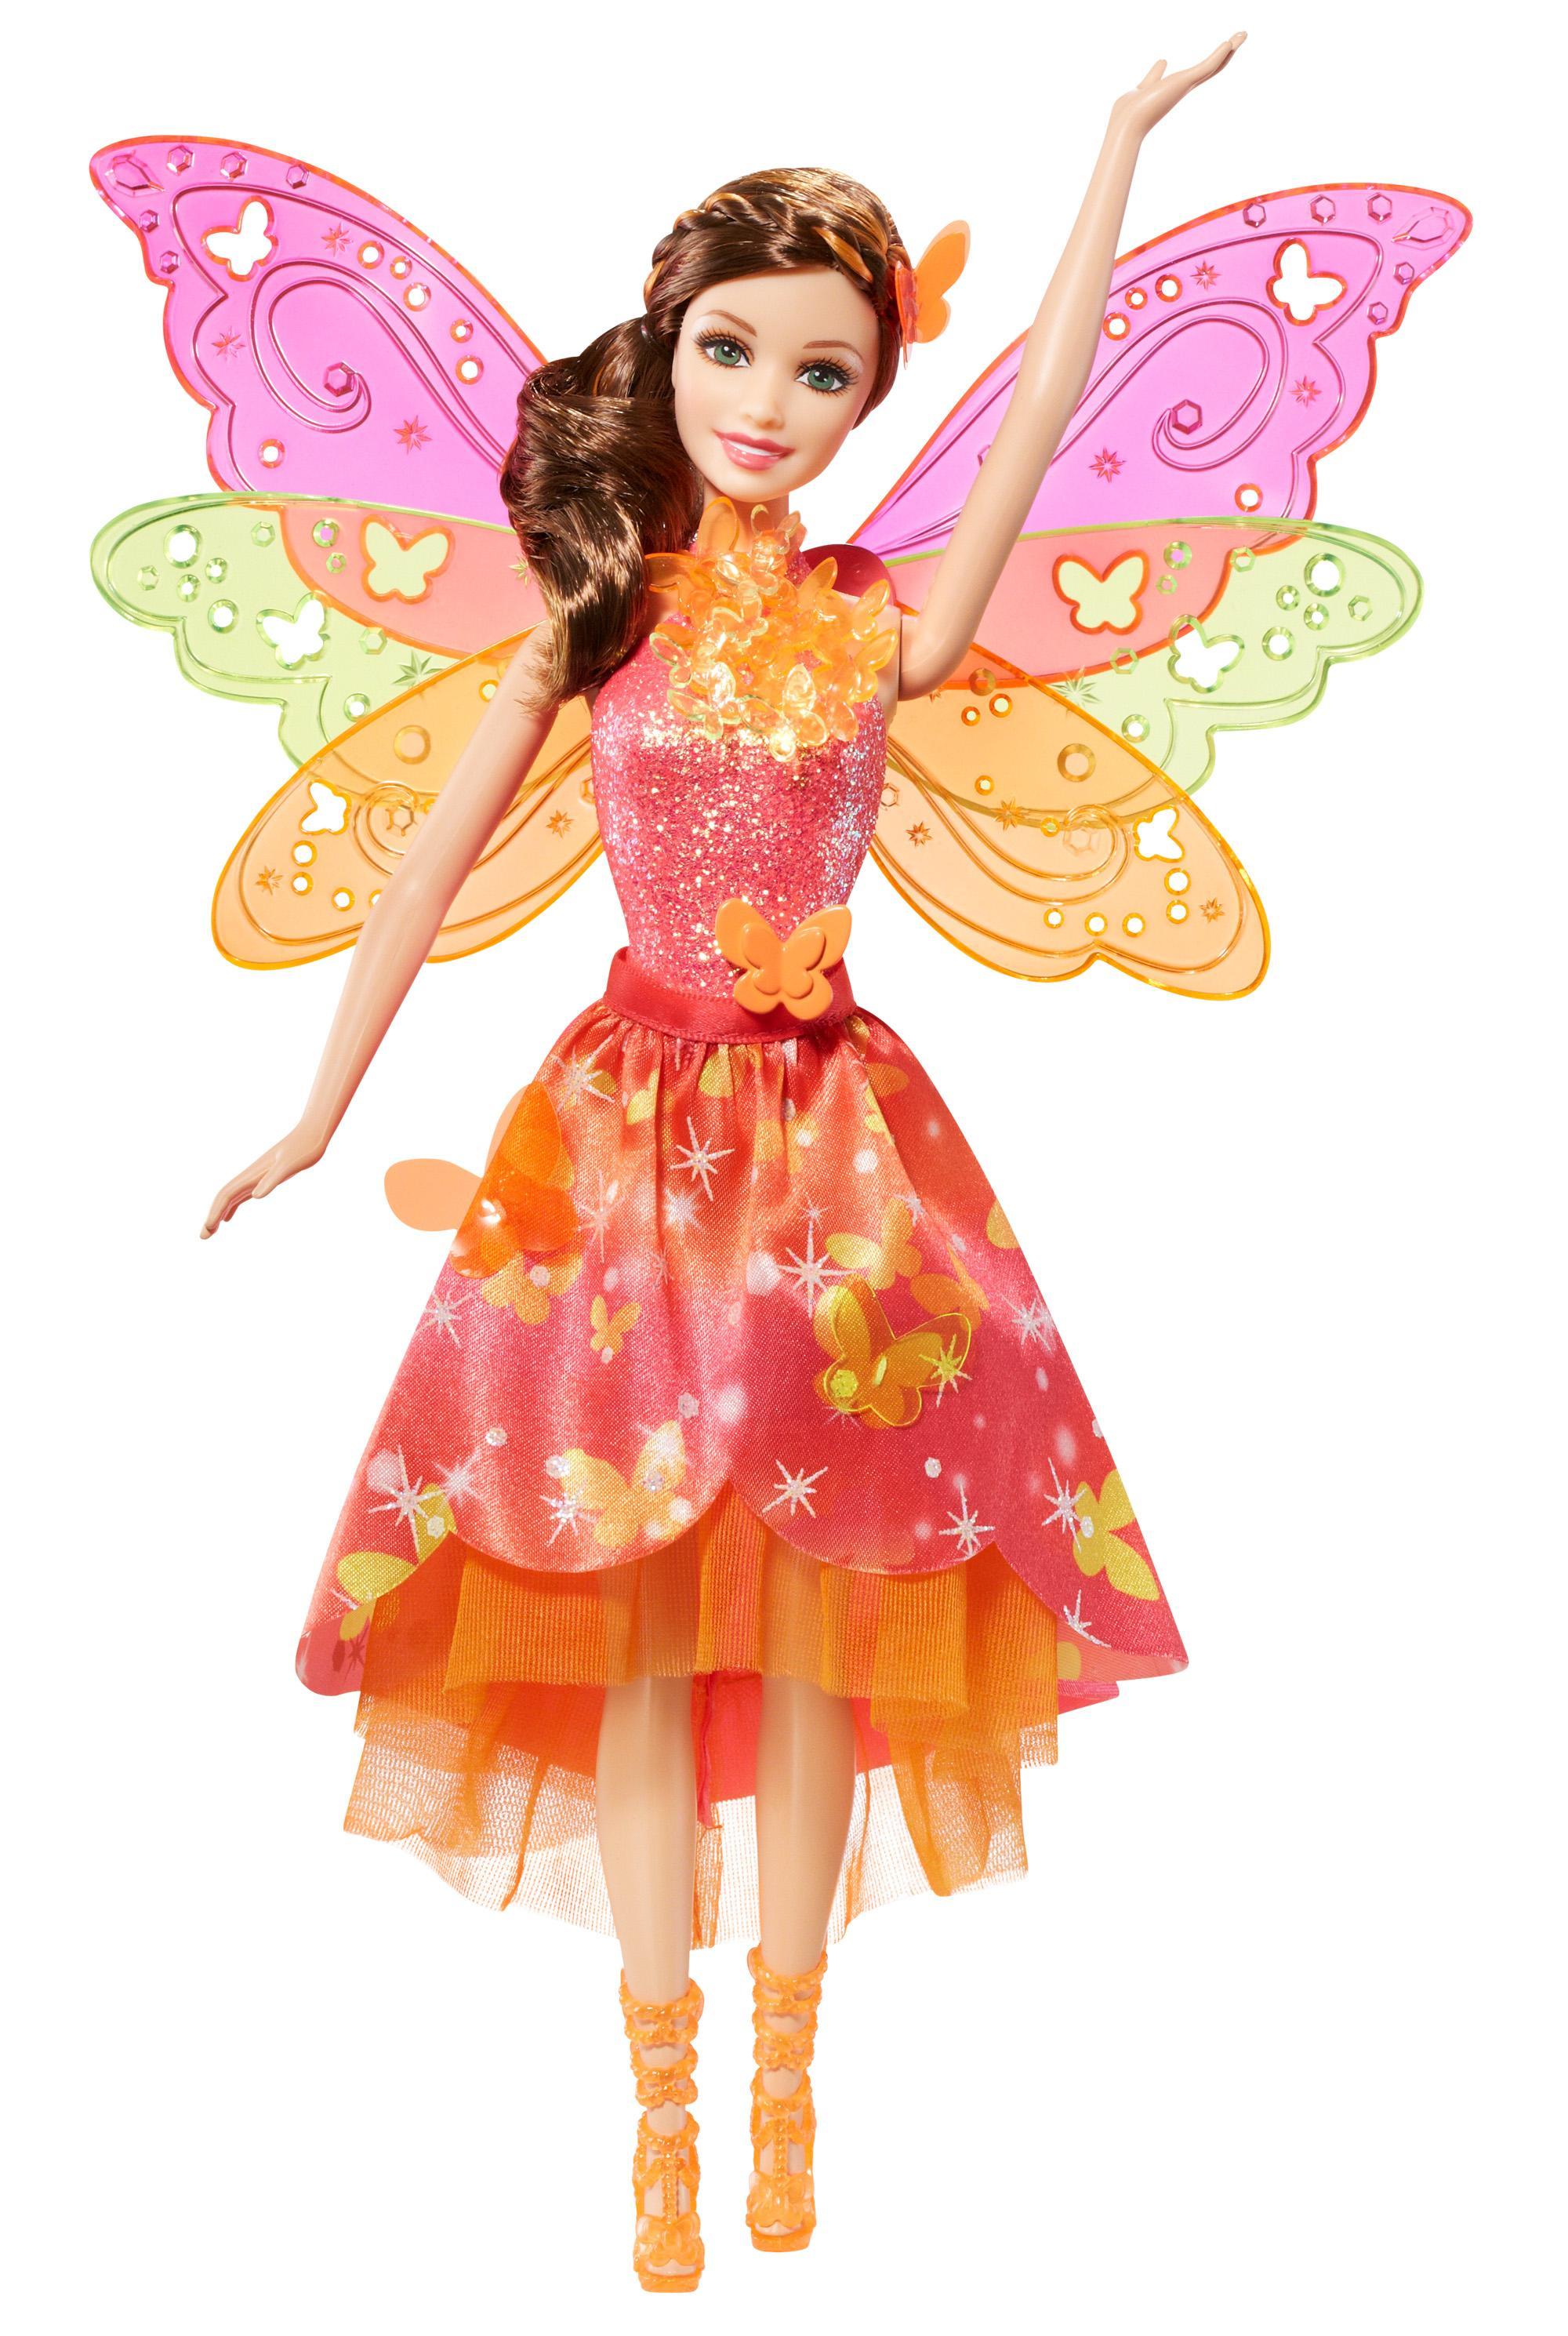 Barbie clipart wing wallpaper  com: Secret Transforming Fairy